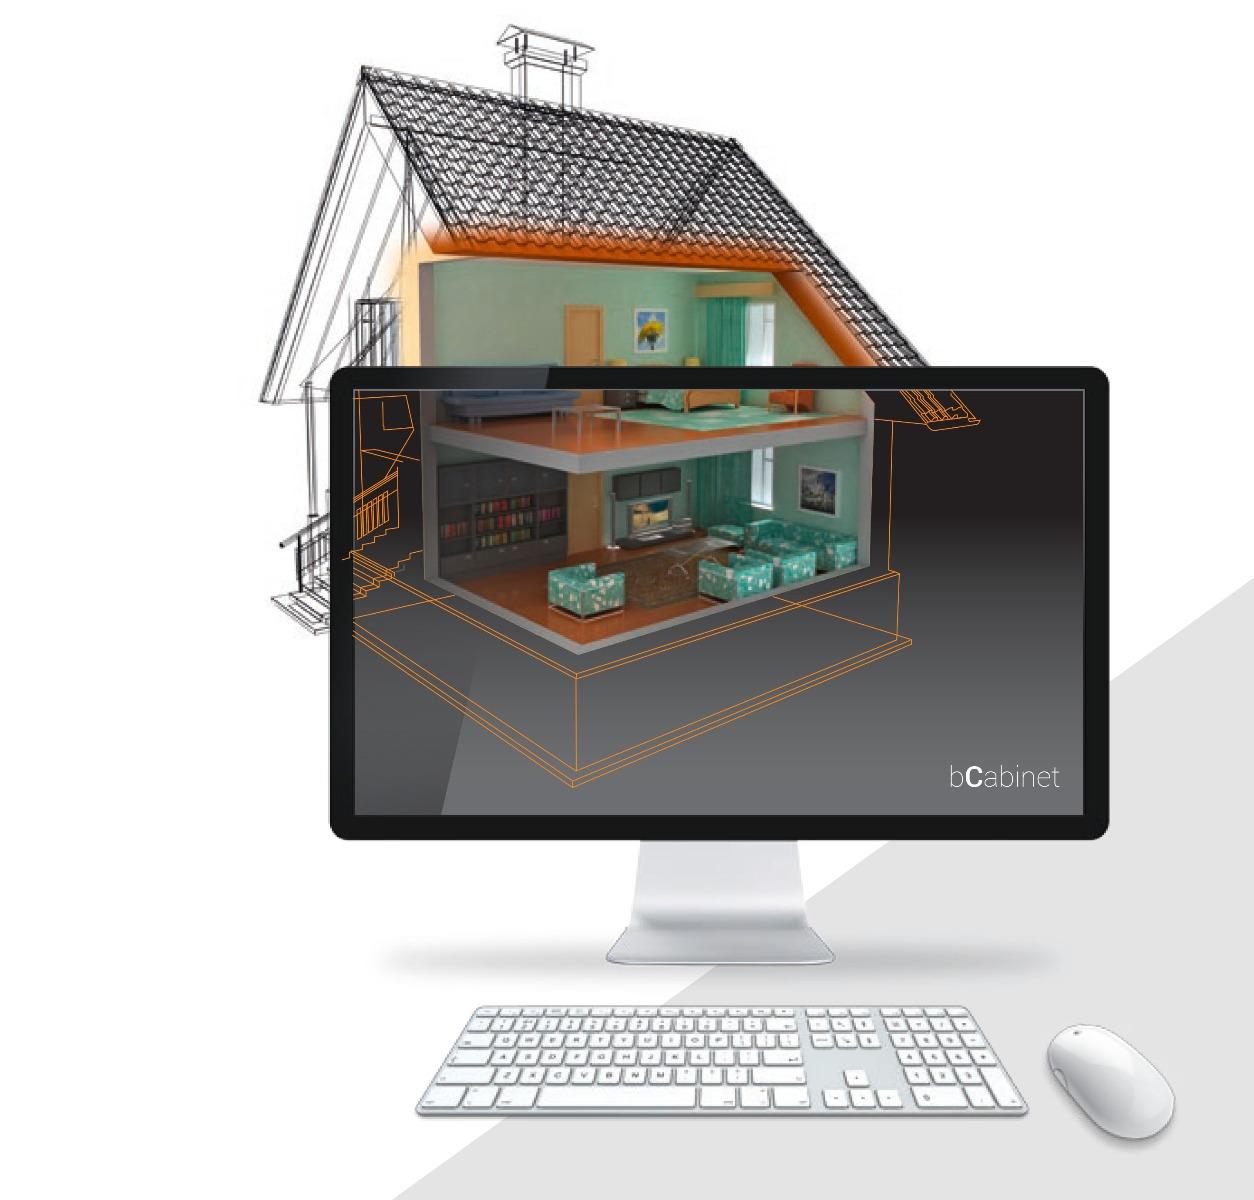 Biesse bCabinet interieur software